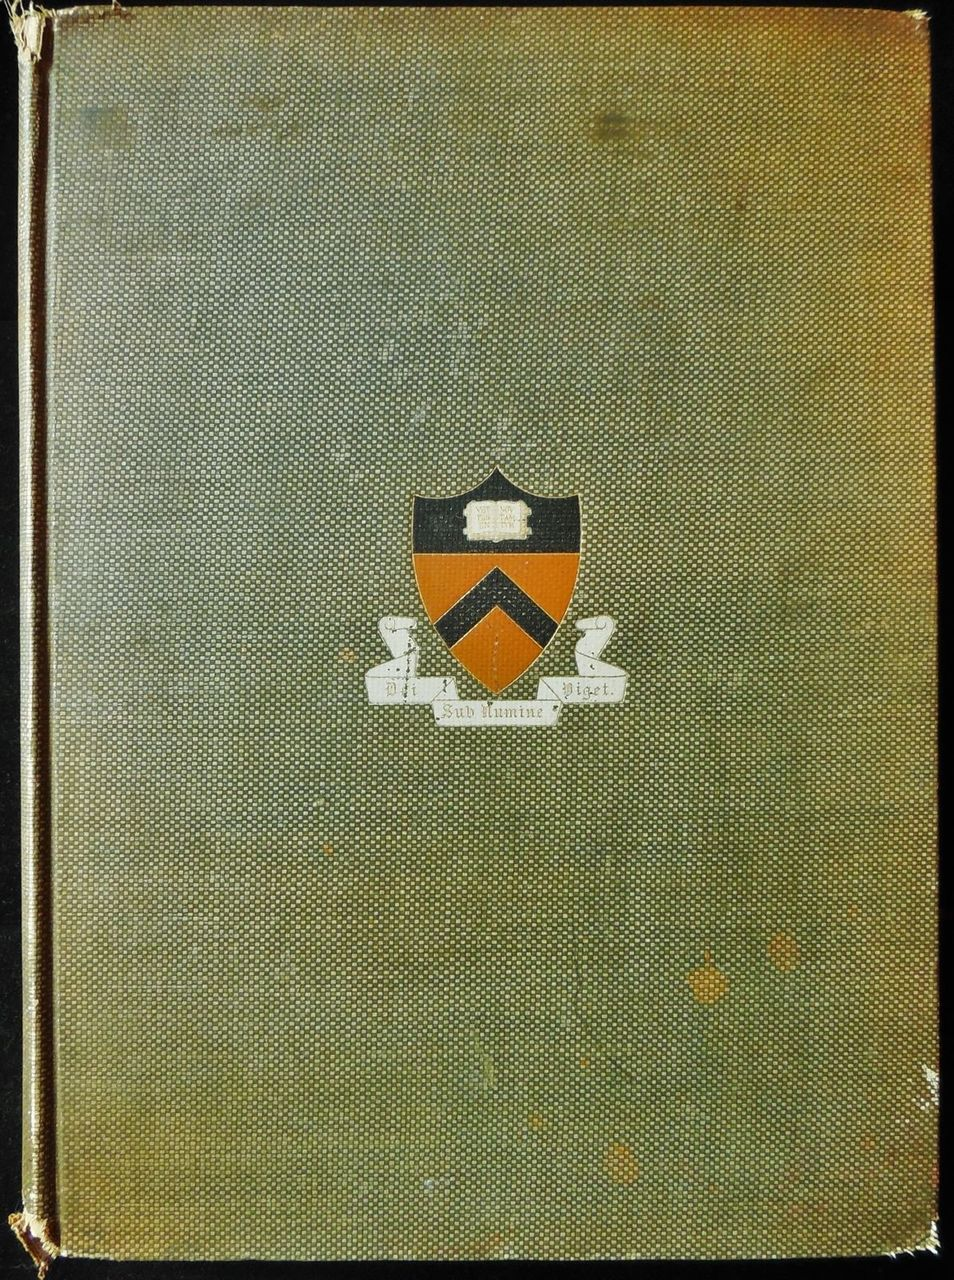 MEMORIAL BOOK OF THE SESQUICENTENNIAL CELEBRATION...PRINCETON UNIVERSITY - 1898